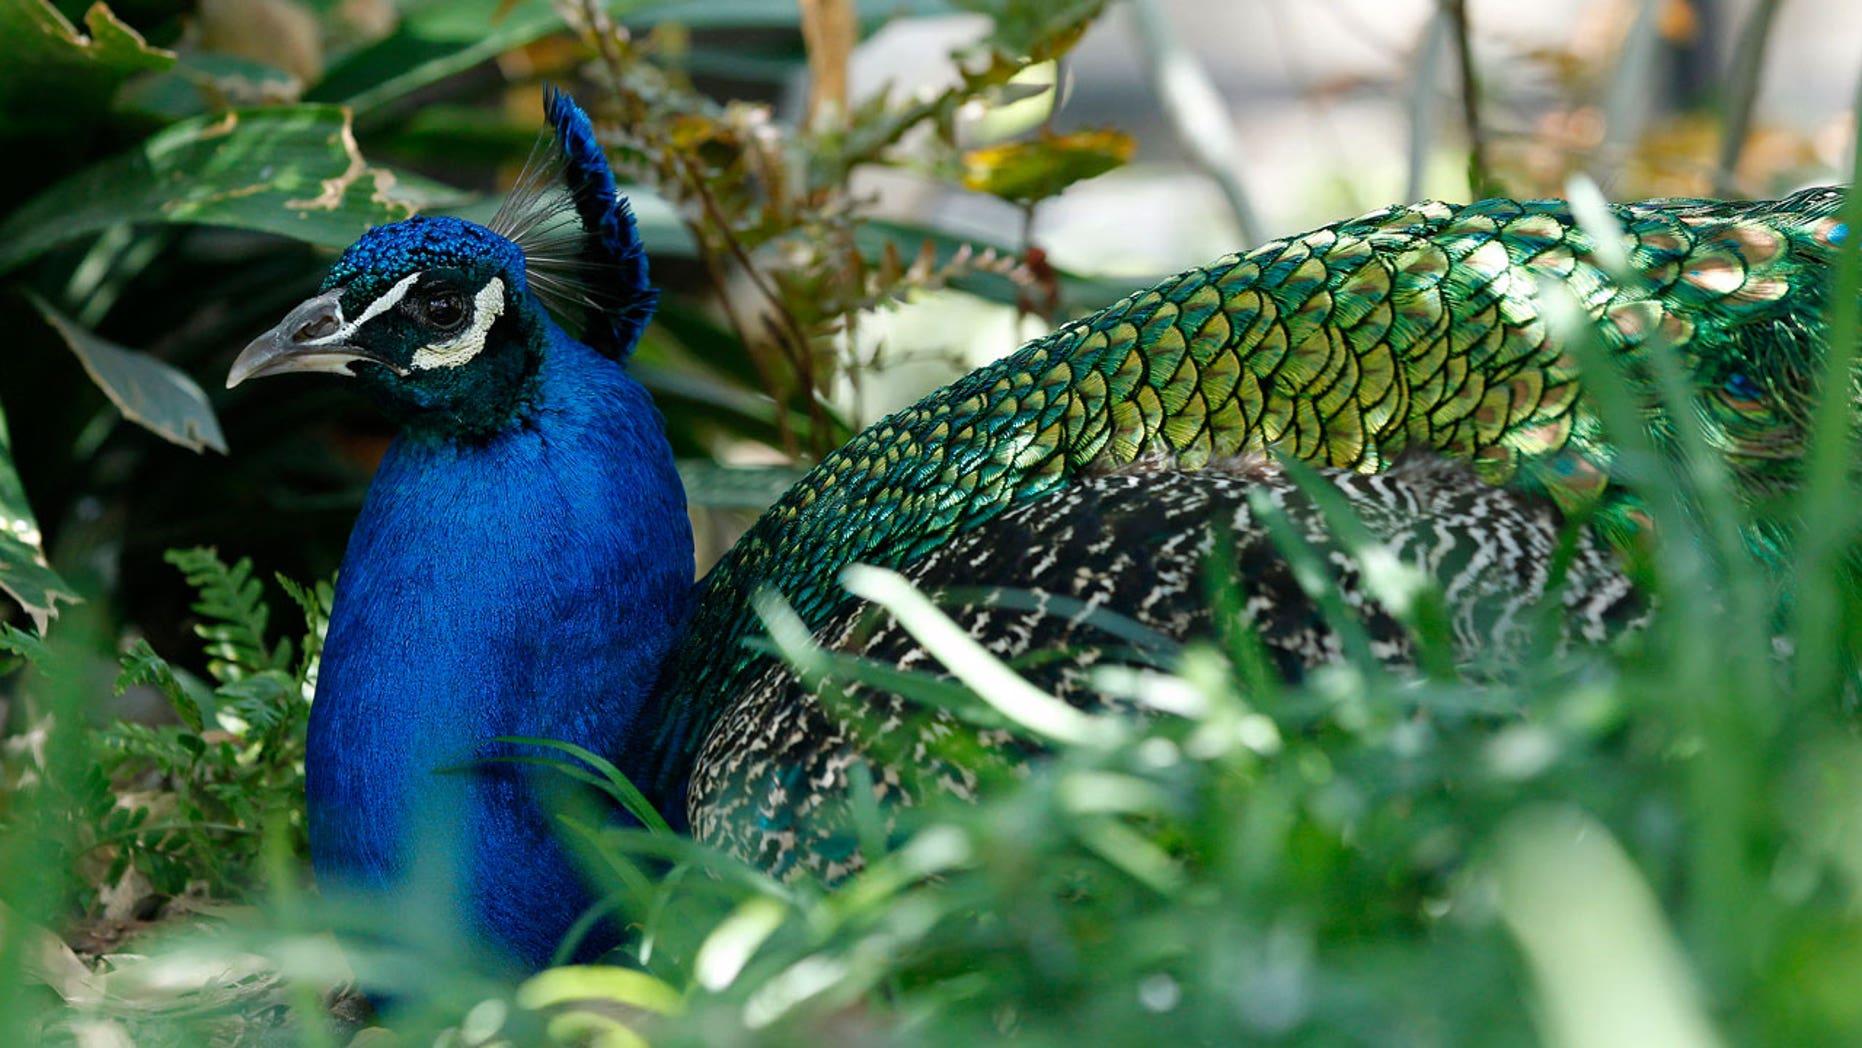 A wild peacock in Arcadia, Calif., wreaked havoc on the Royal Oaks liquor store.